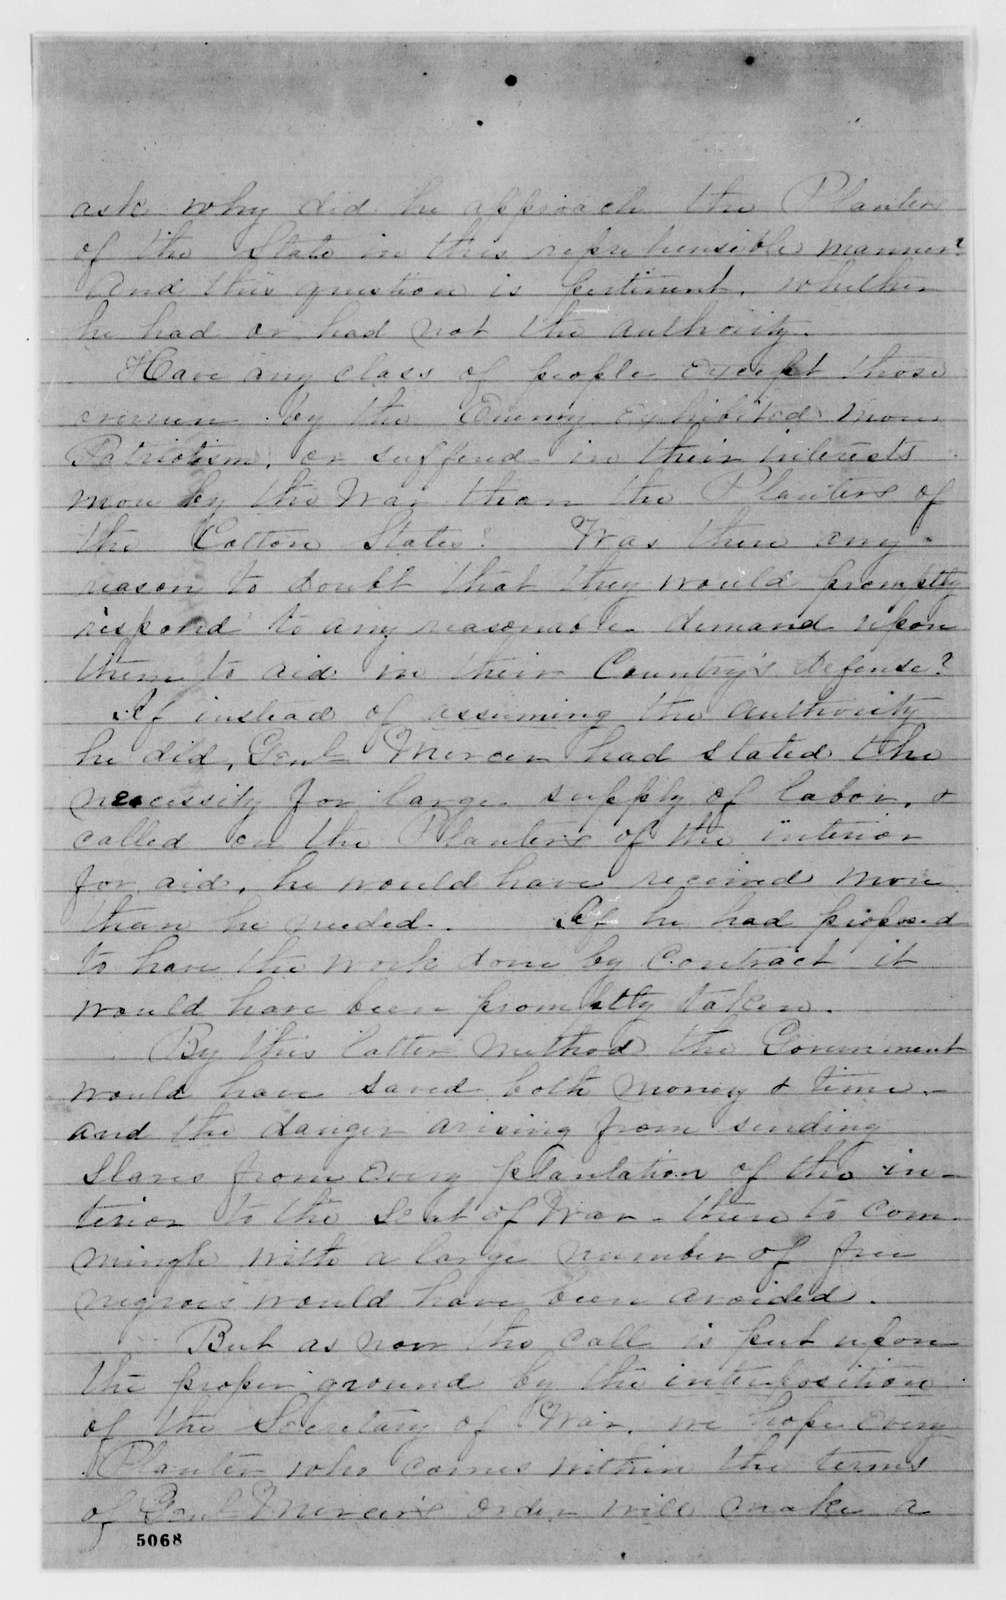 Alexander Hamilton Stephens Papers: General Correspondence, 1784-1886; 1862, June 19-Sept. 8